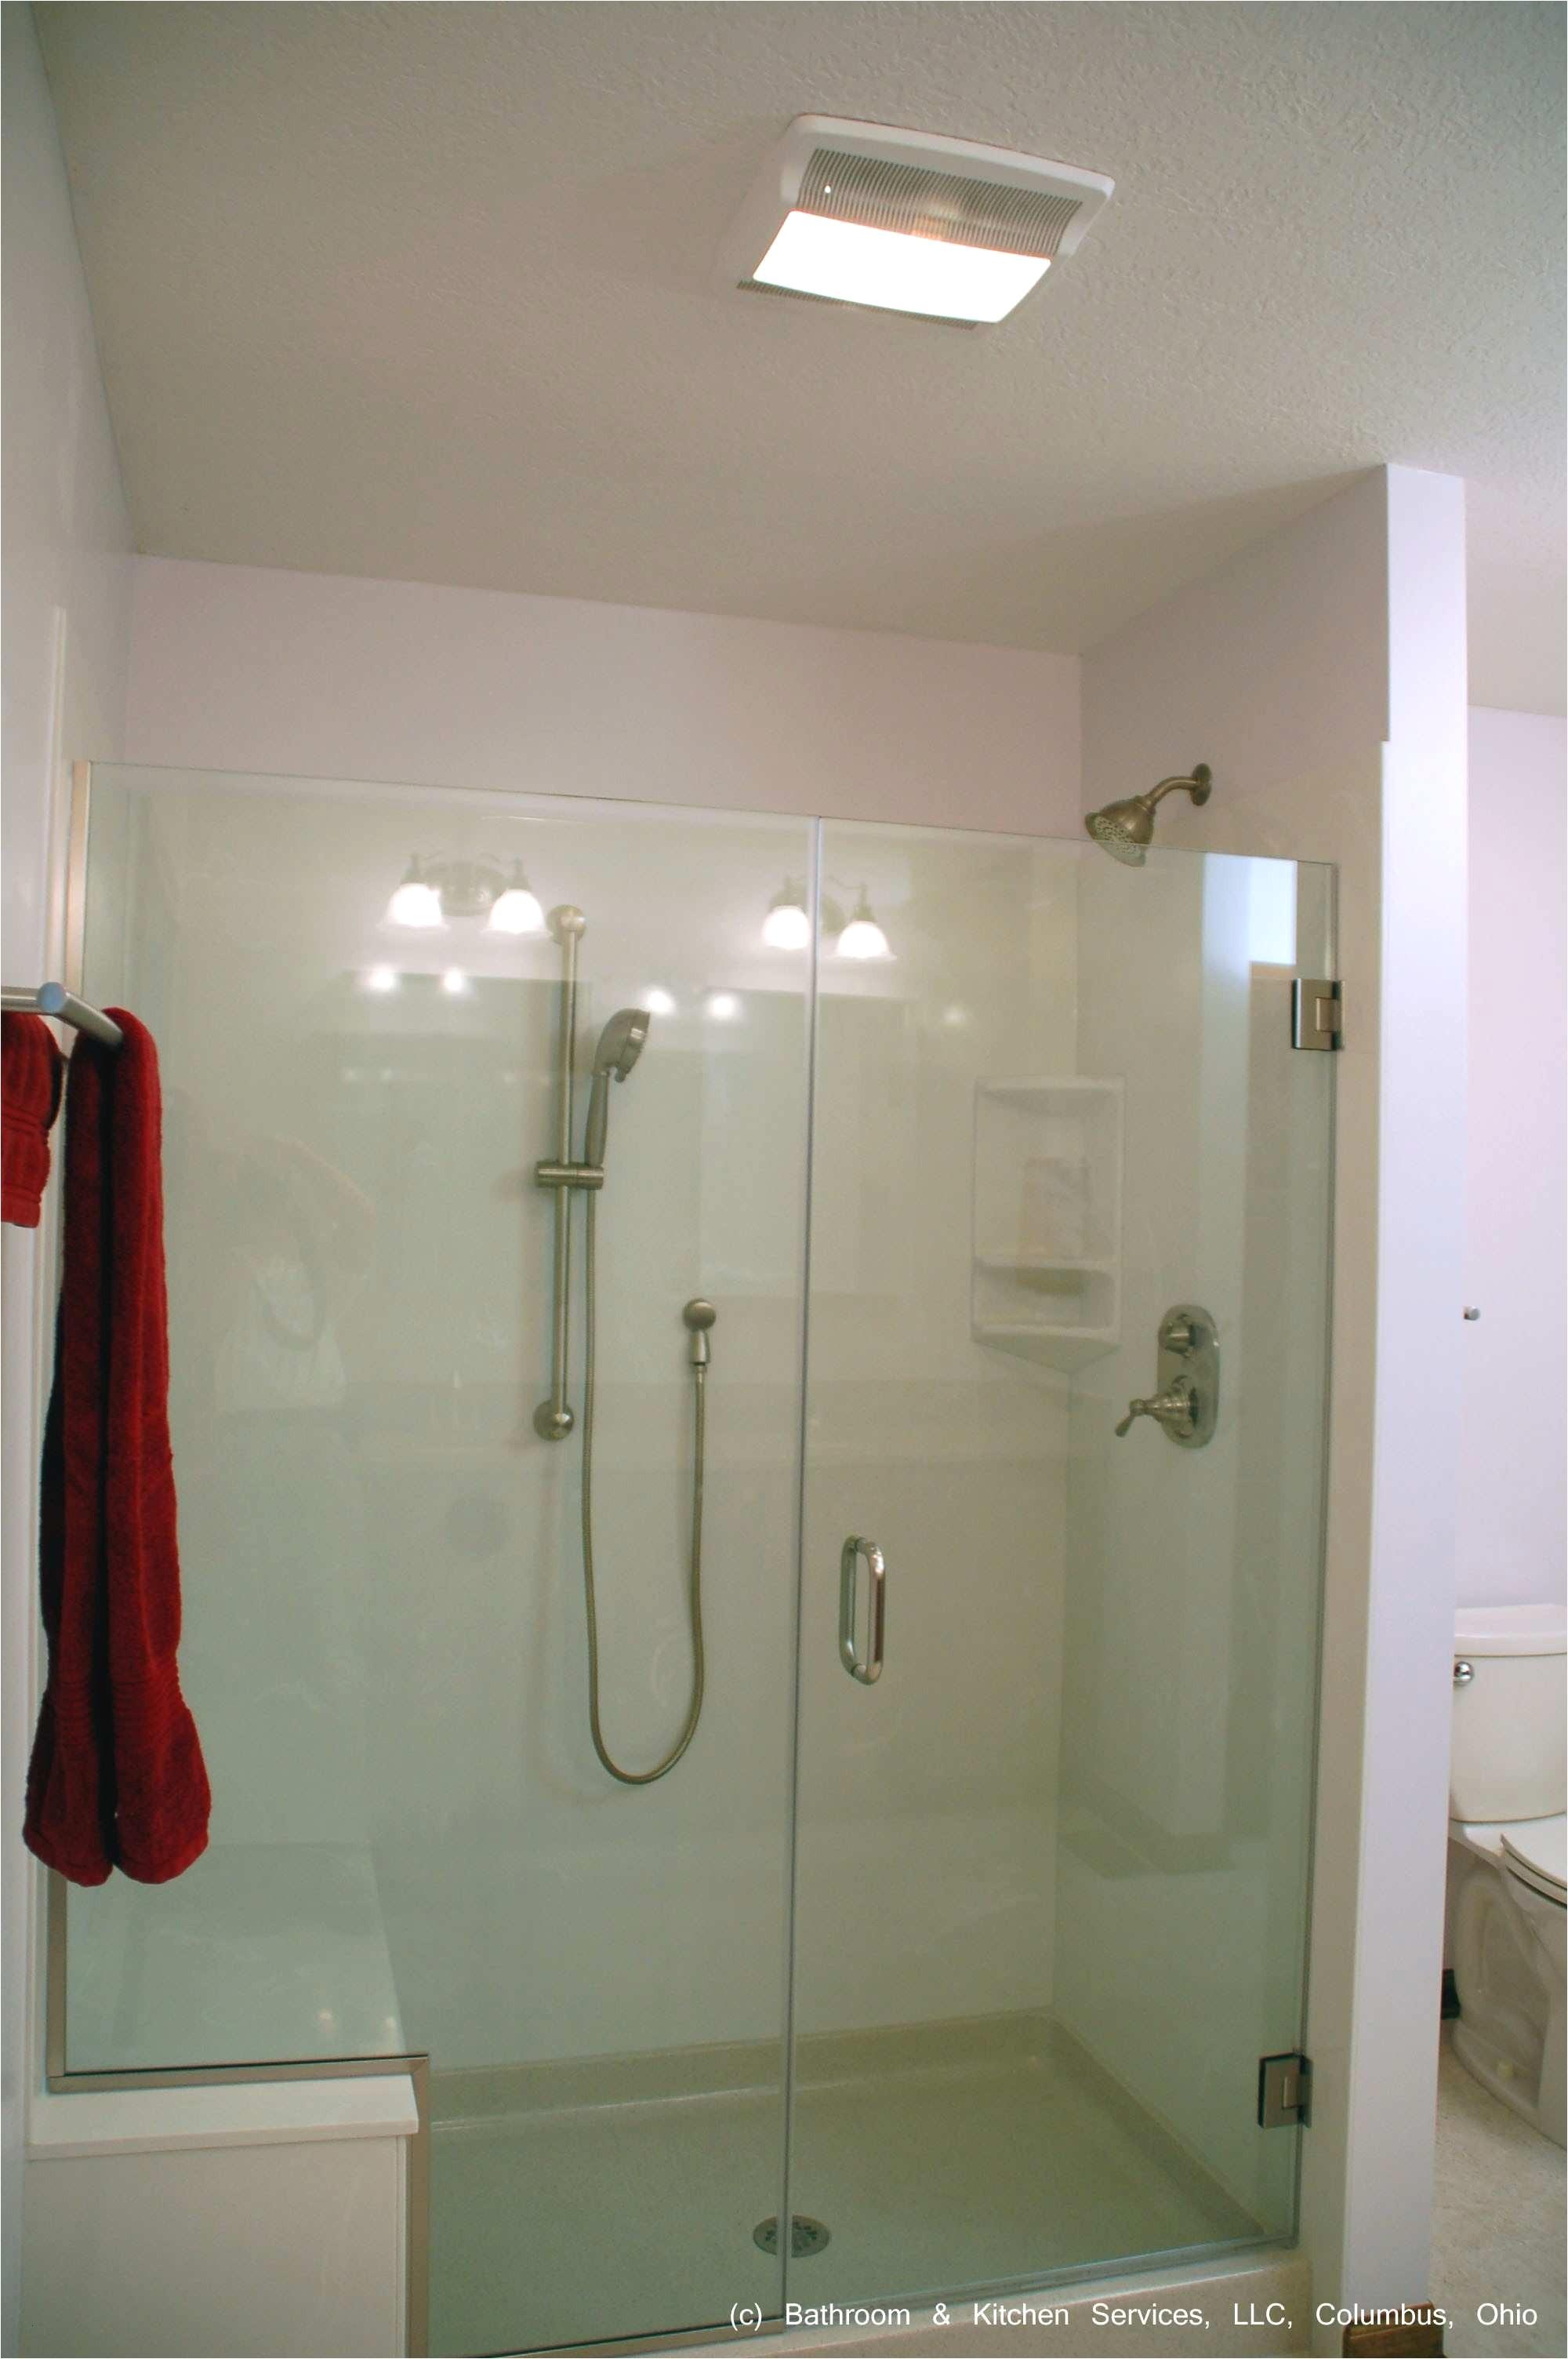 bathroom lights luxury luxury bathroom shower light new h sink install bathroom i 0d scheme